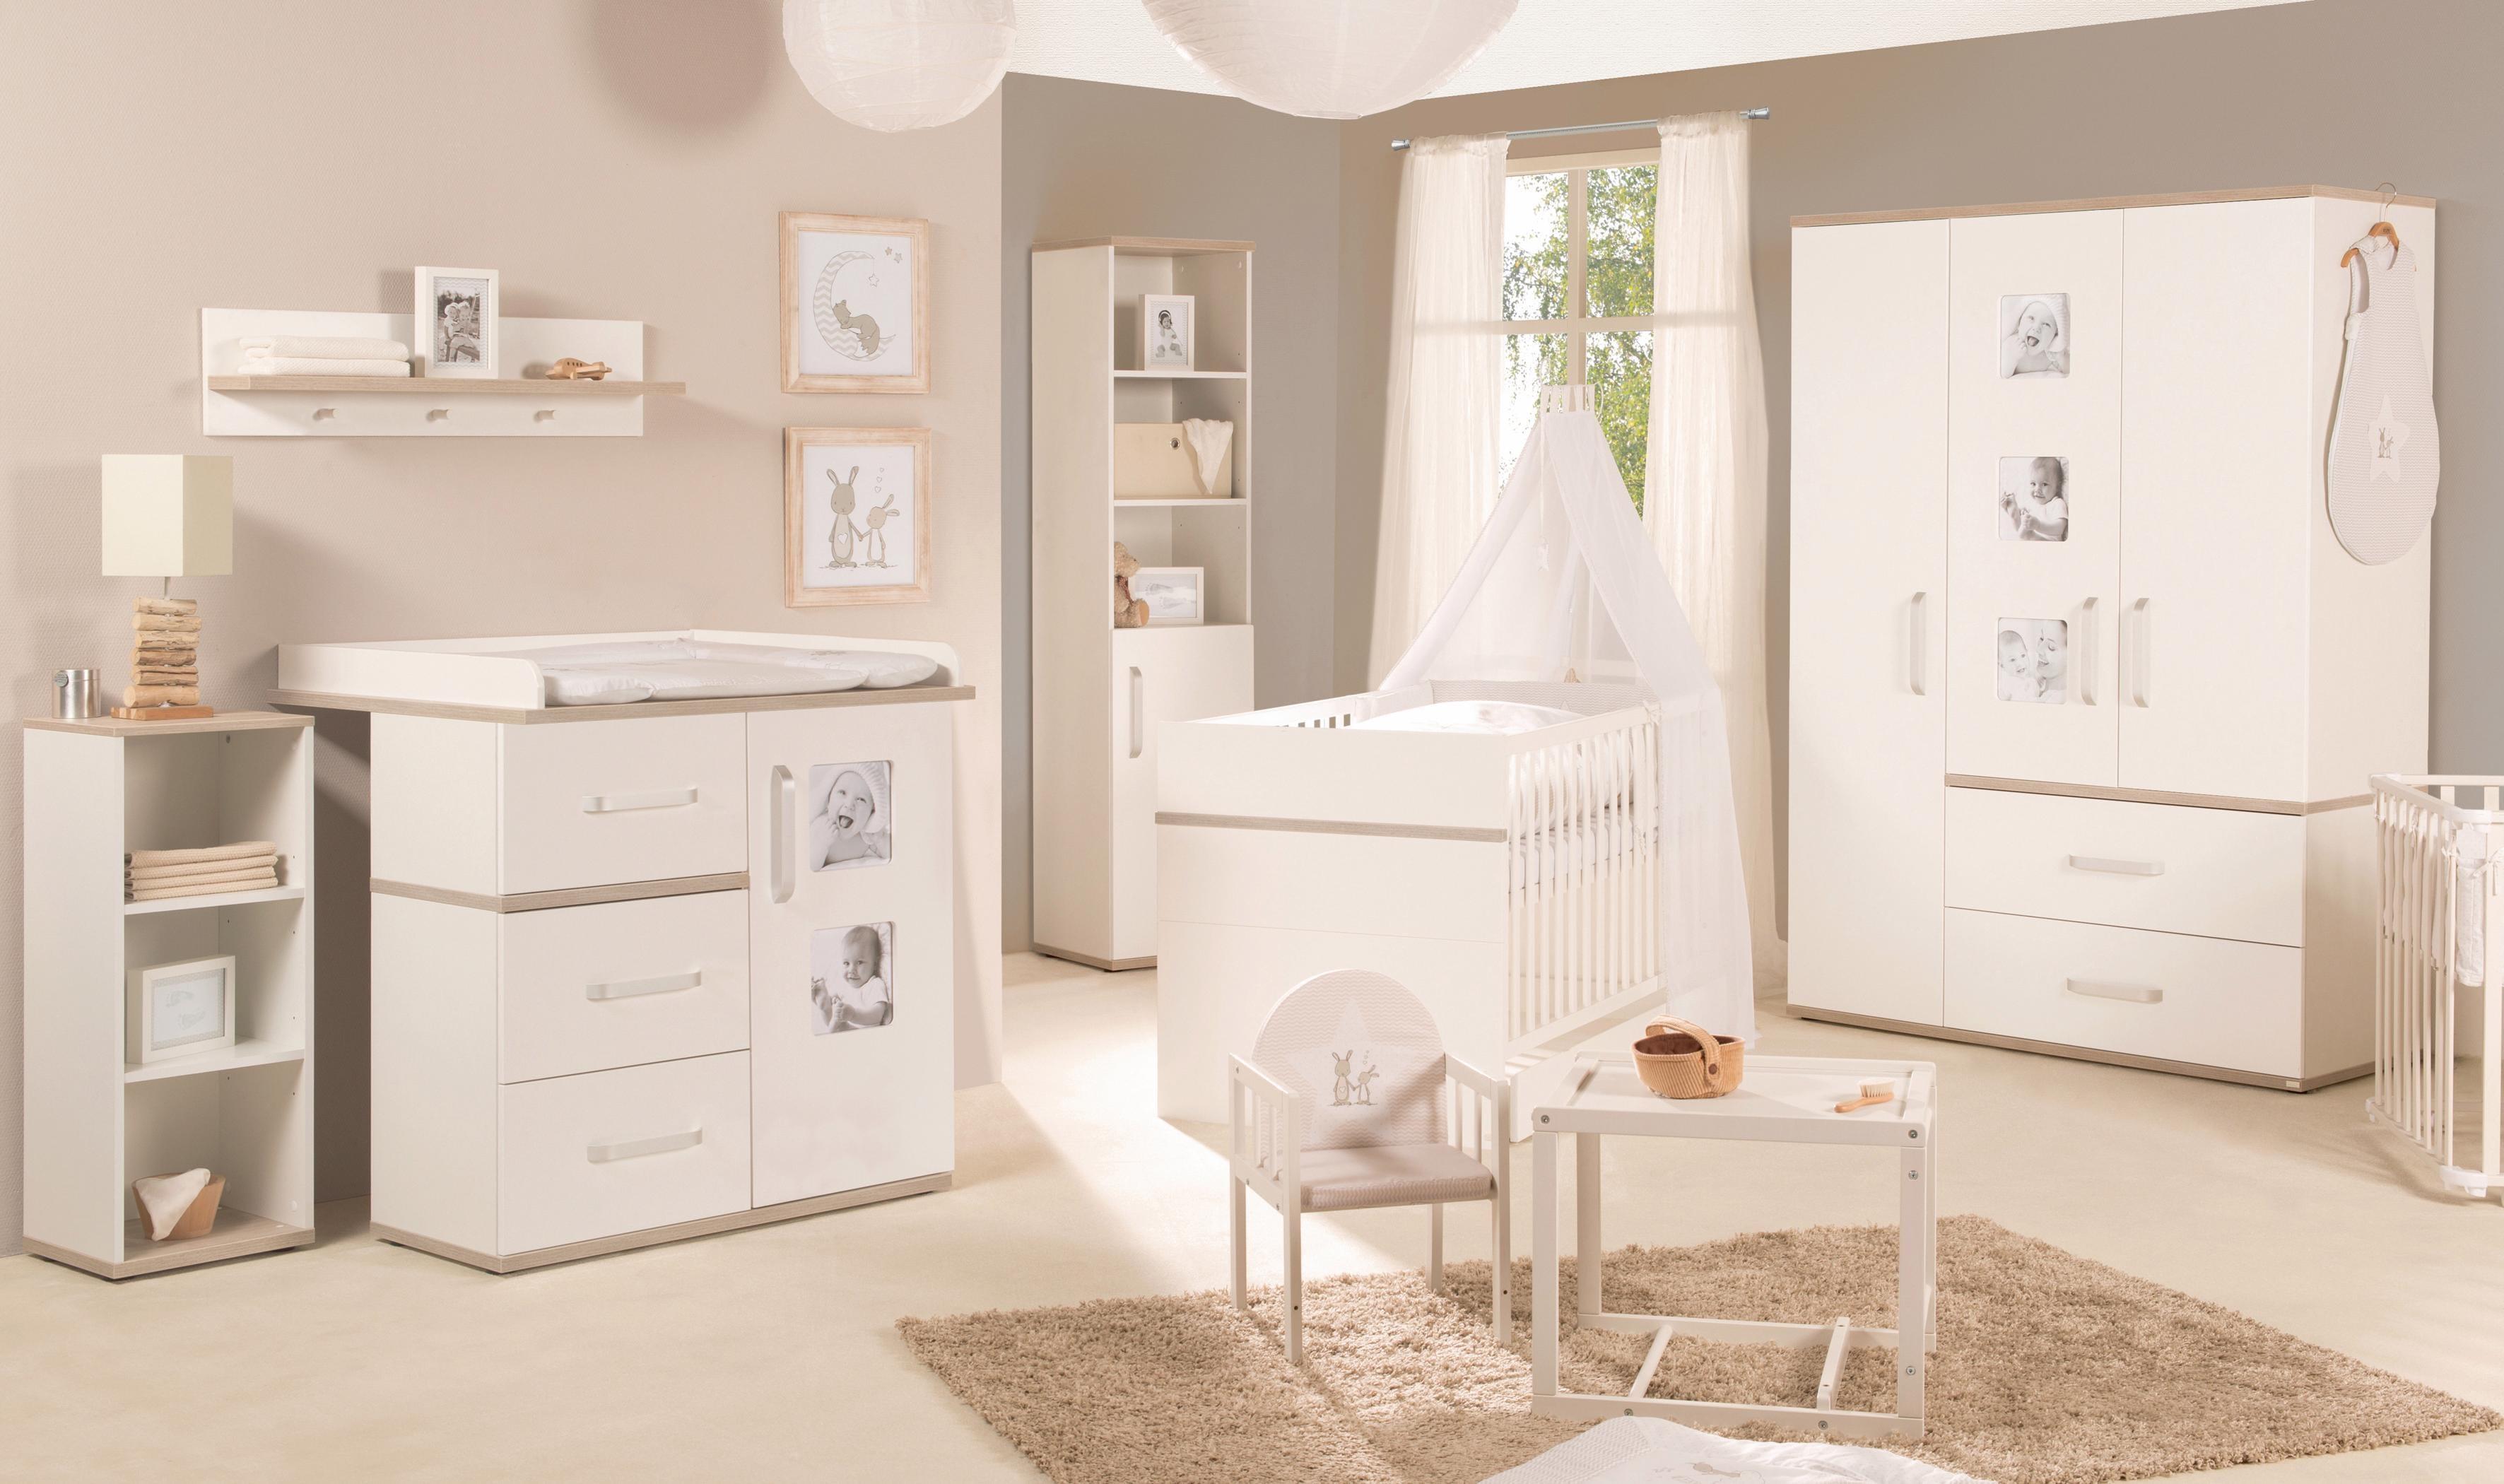 Babyzimmer Komplett Set Junge